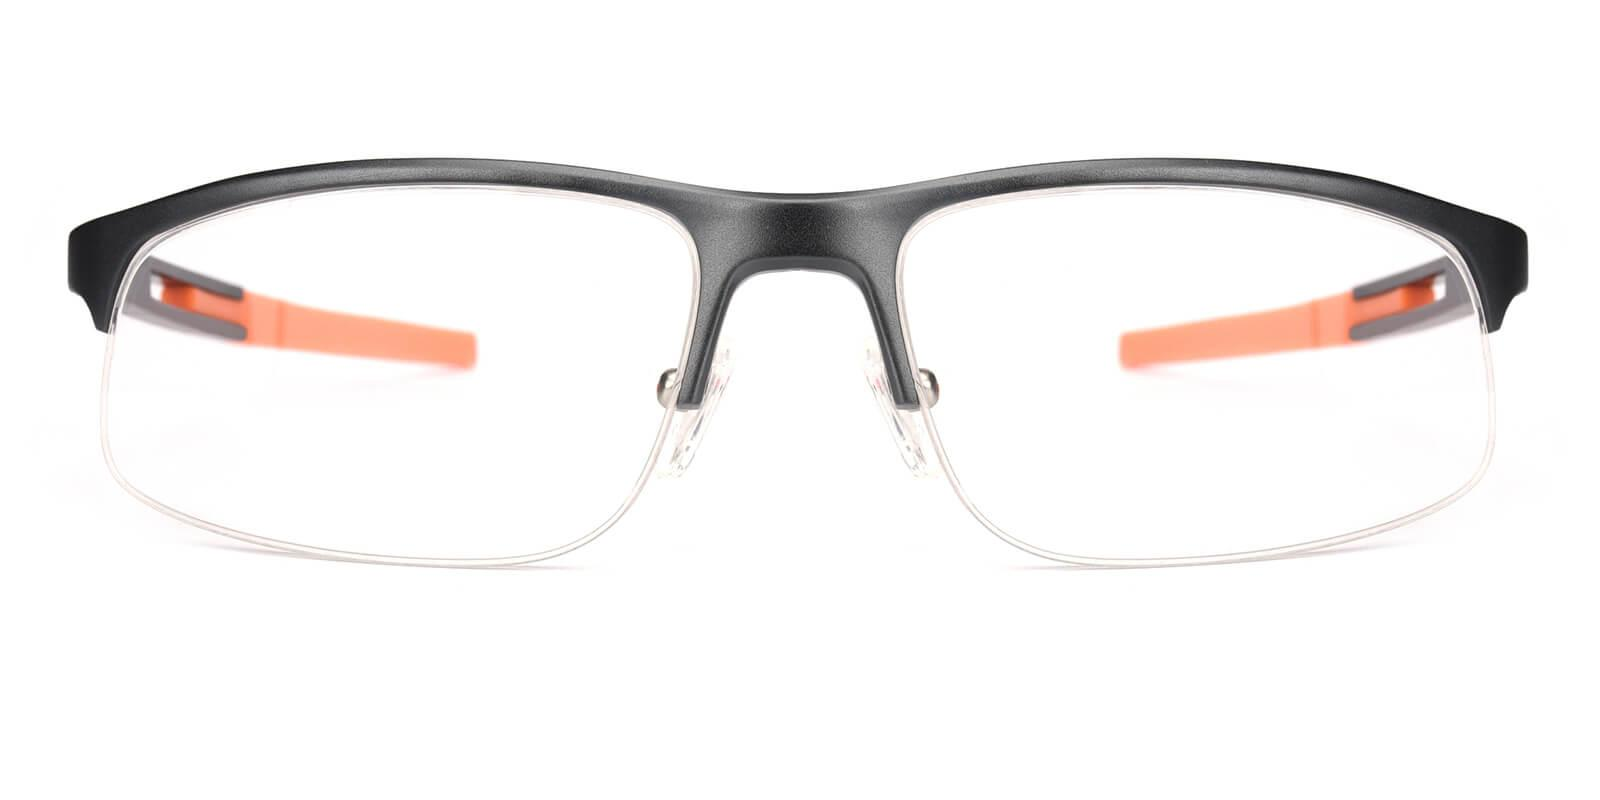 Graysun-Gun-Rectangle-Metal-SportsGlasses-additional2